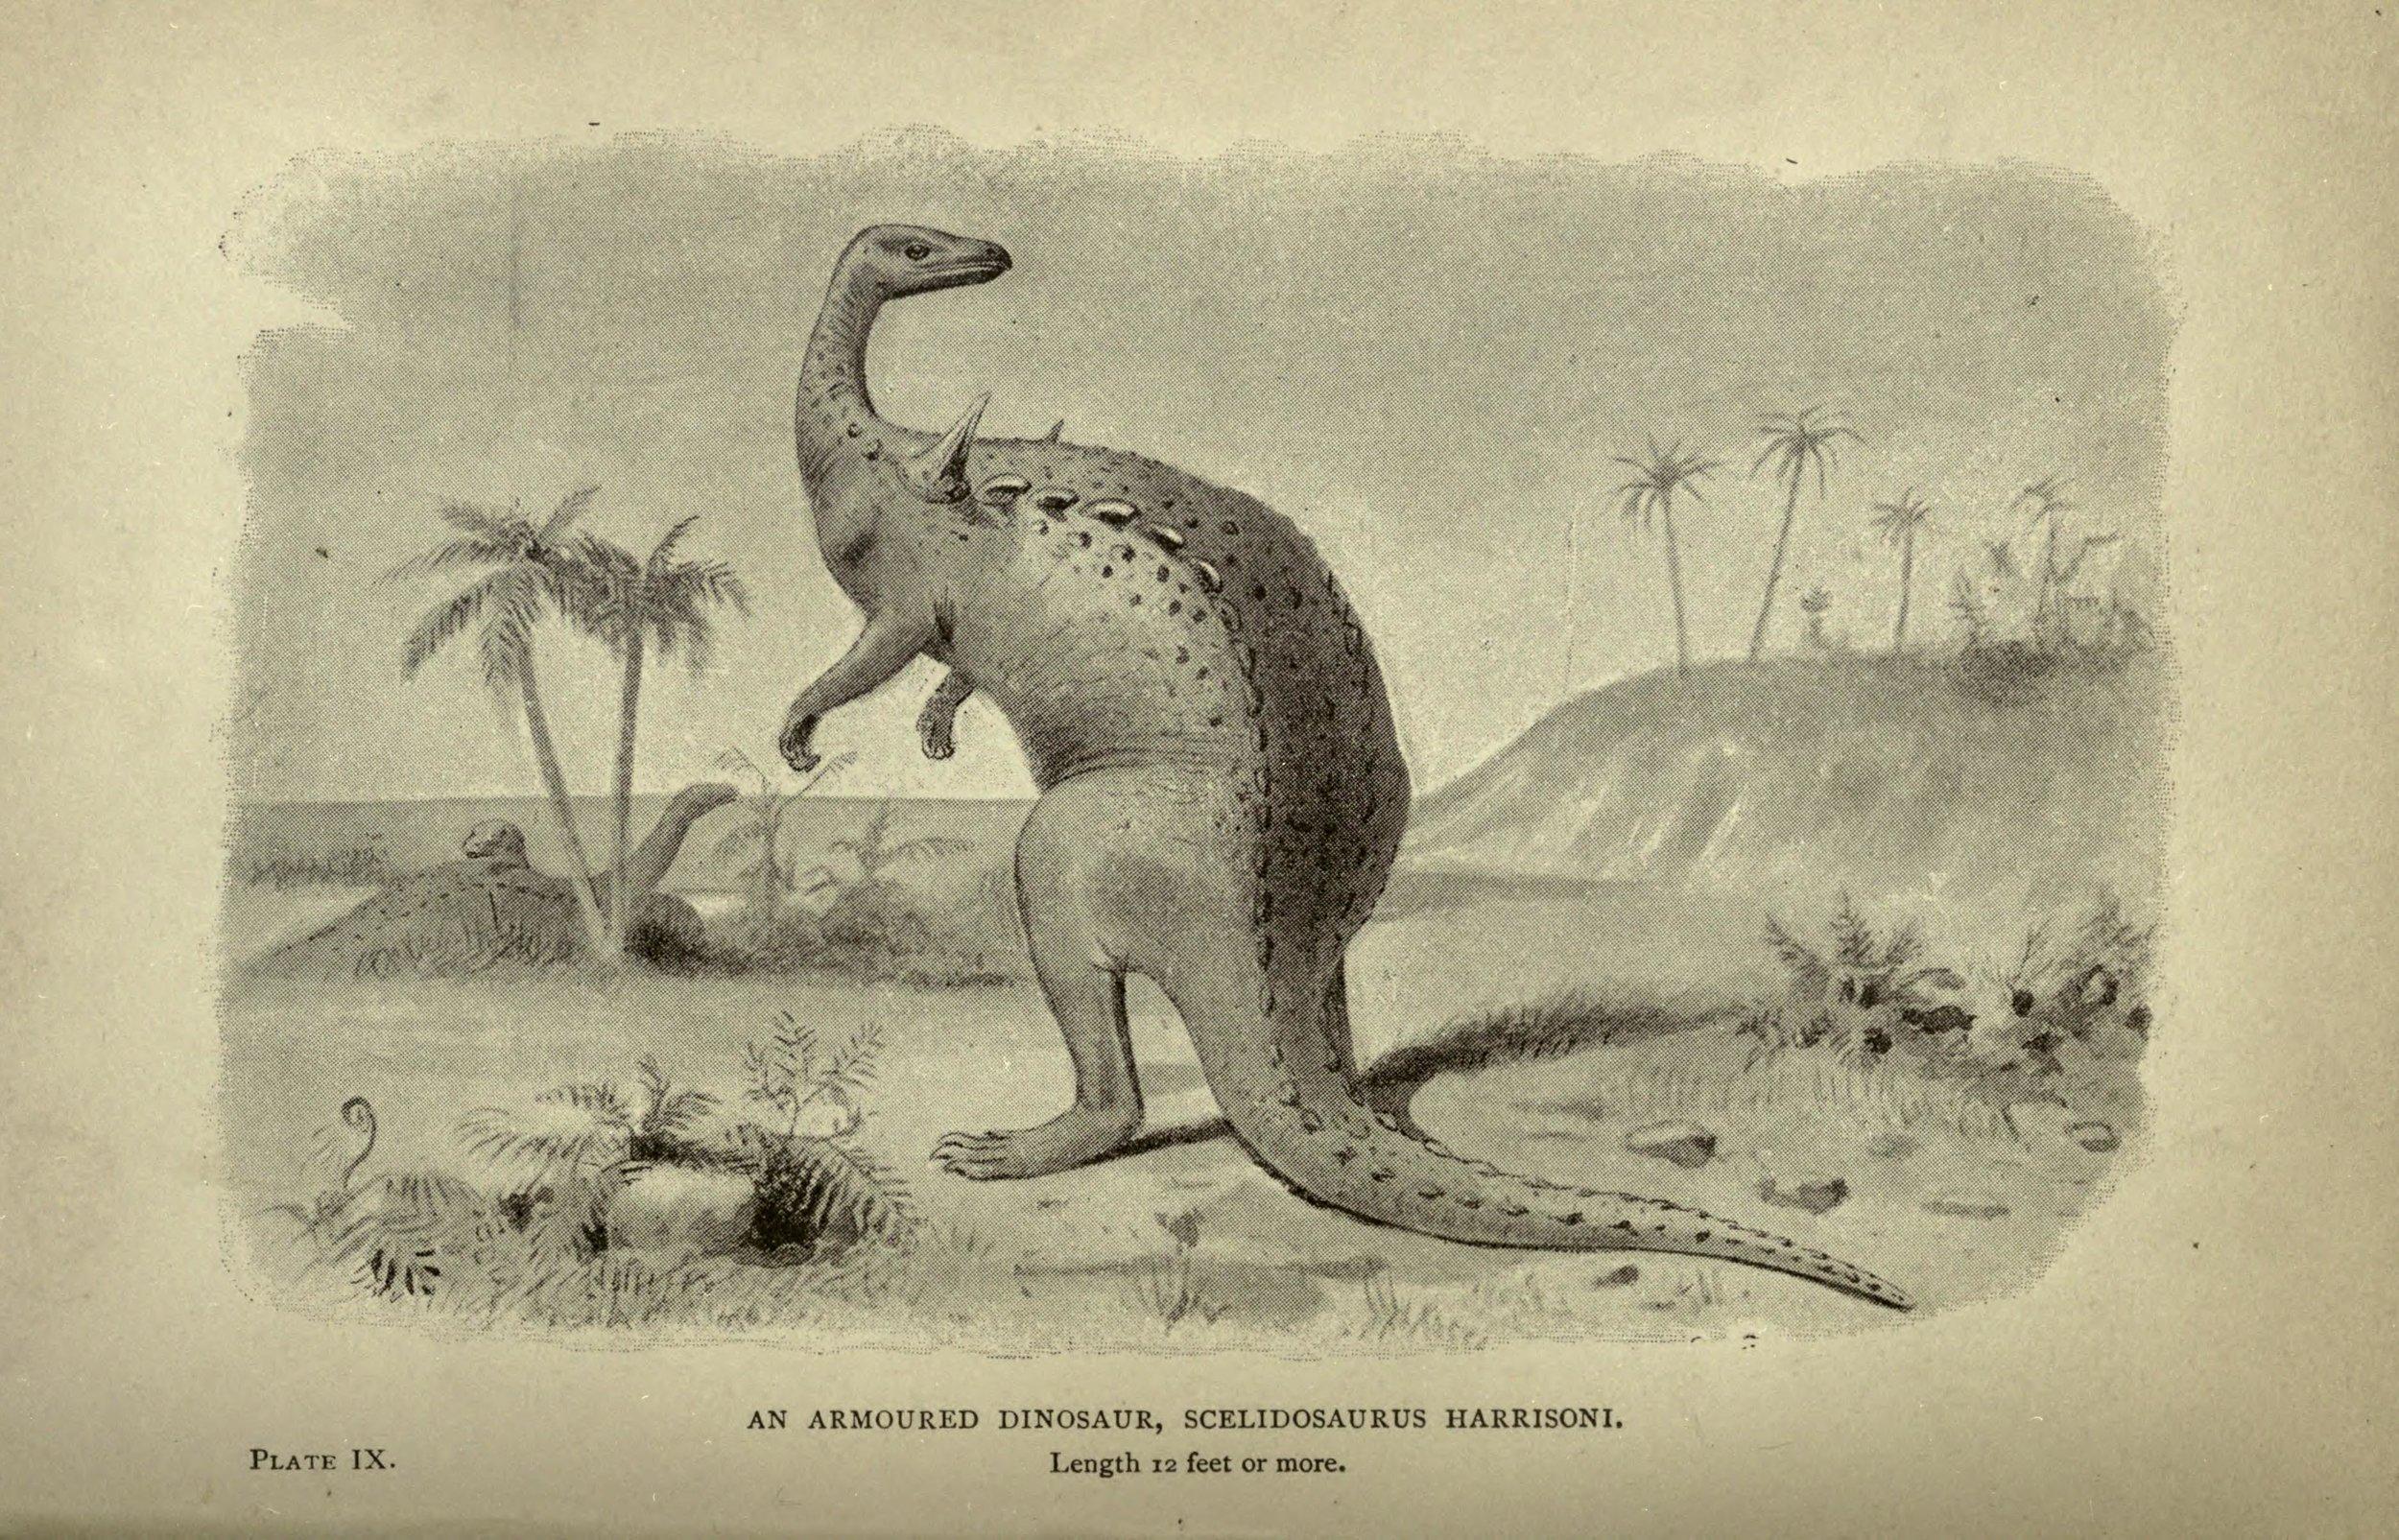 Figure     1    :  Scelidosaurus harrisoni  by Joseph Smit, from  Extinct Monsters  (1892)